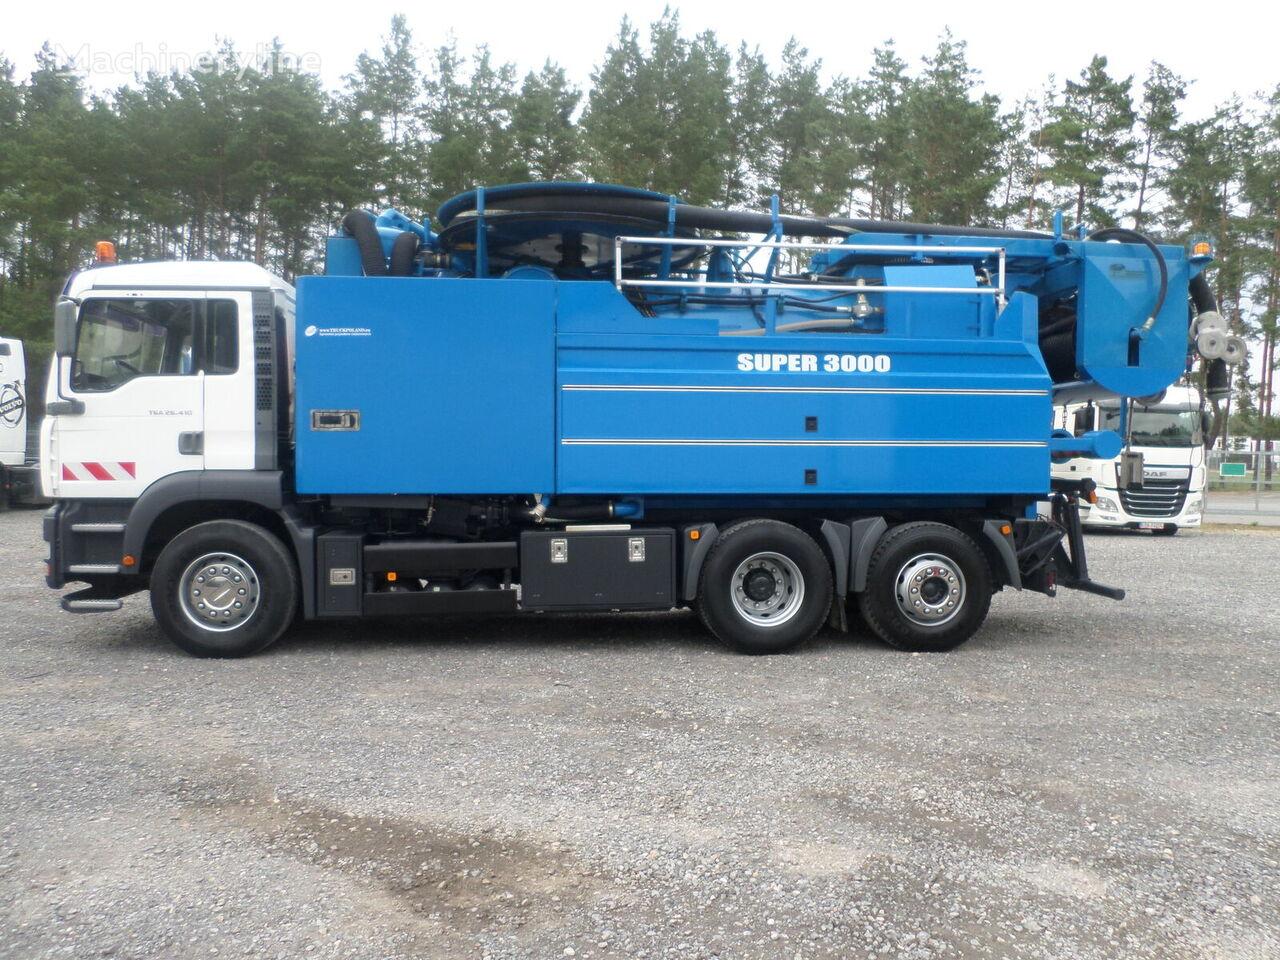 MAN WUKO Wiedemann Super 3000 z recyklingiem PRZEBIEG 53 777 km combination sewer cleaner